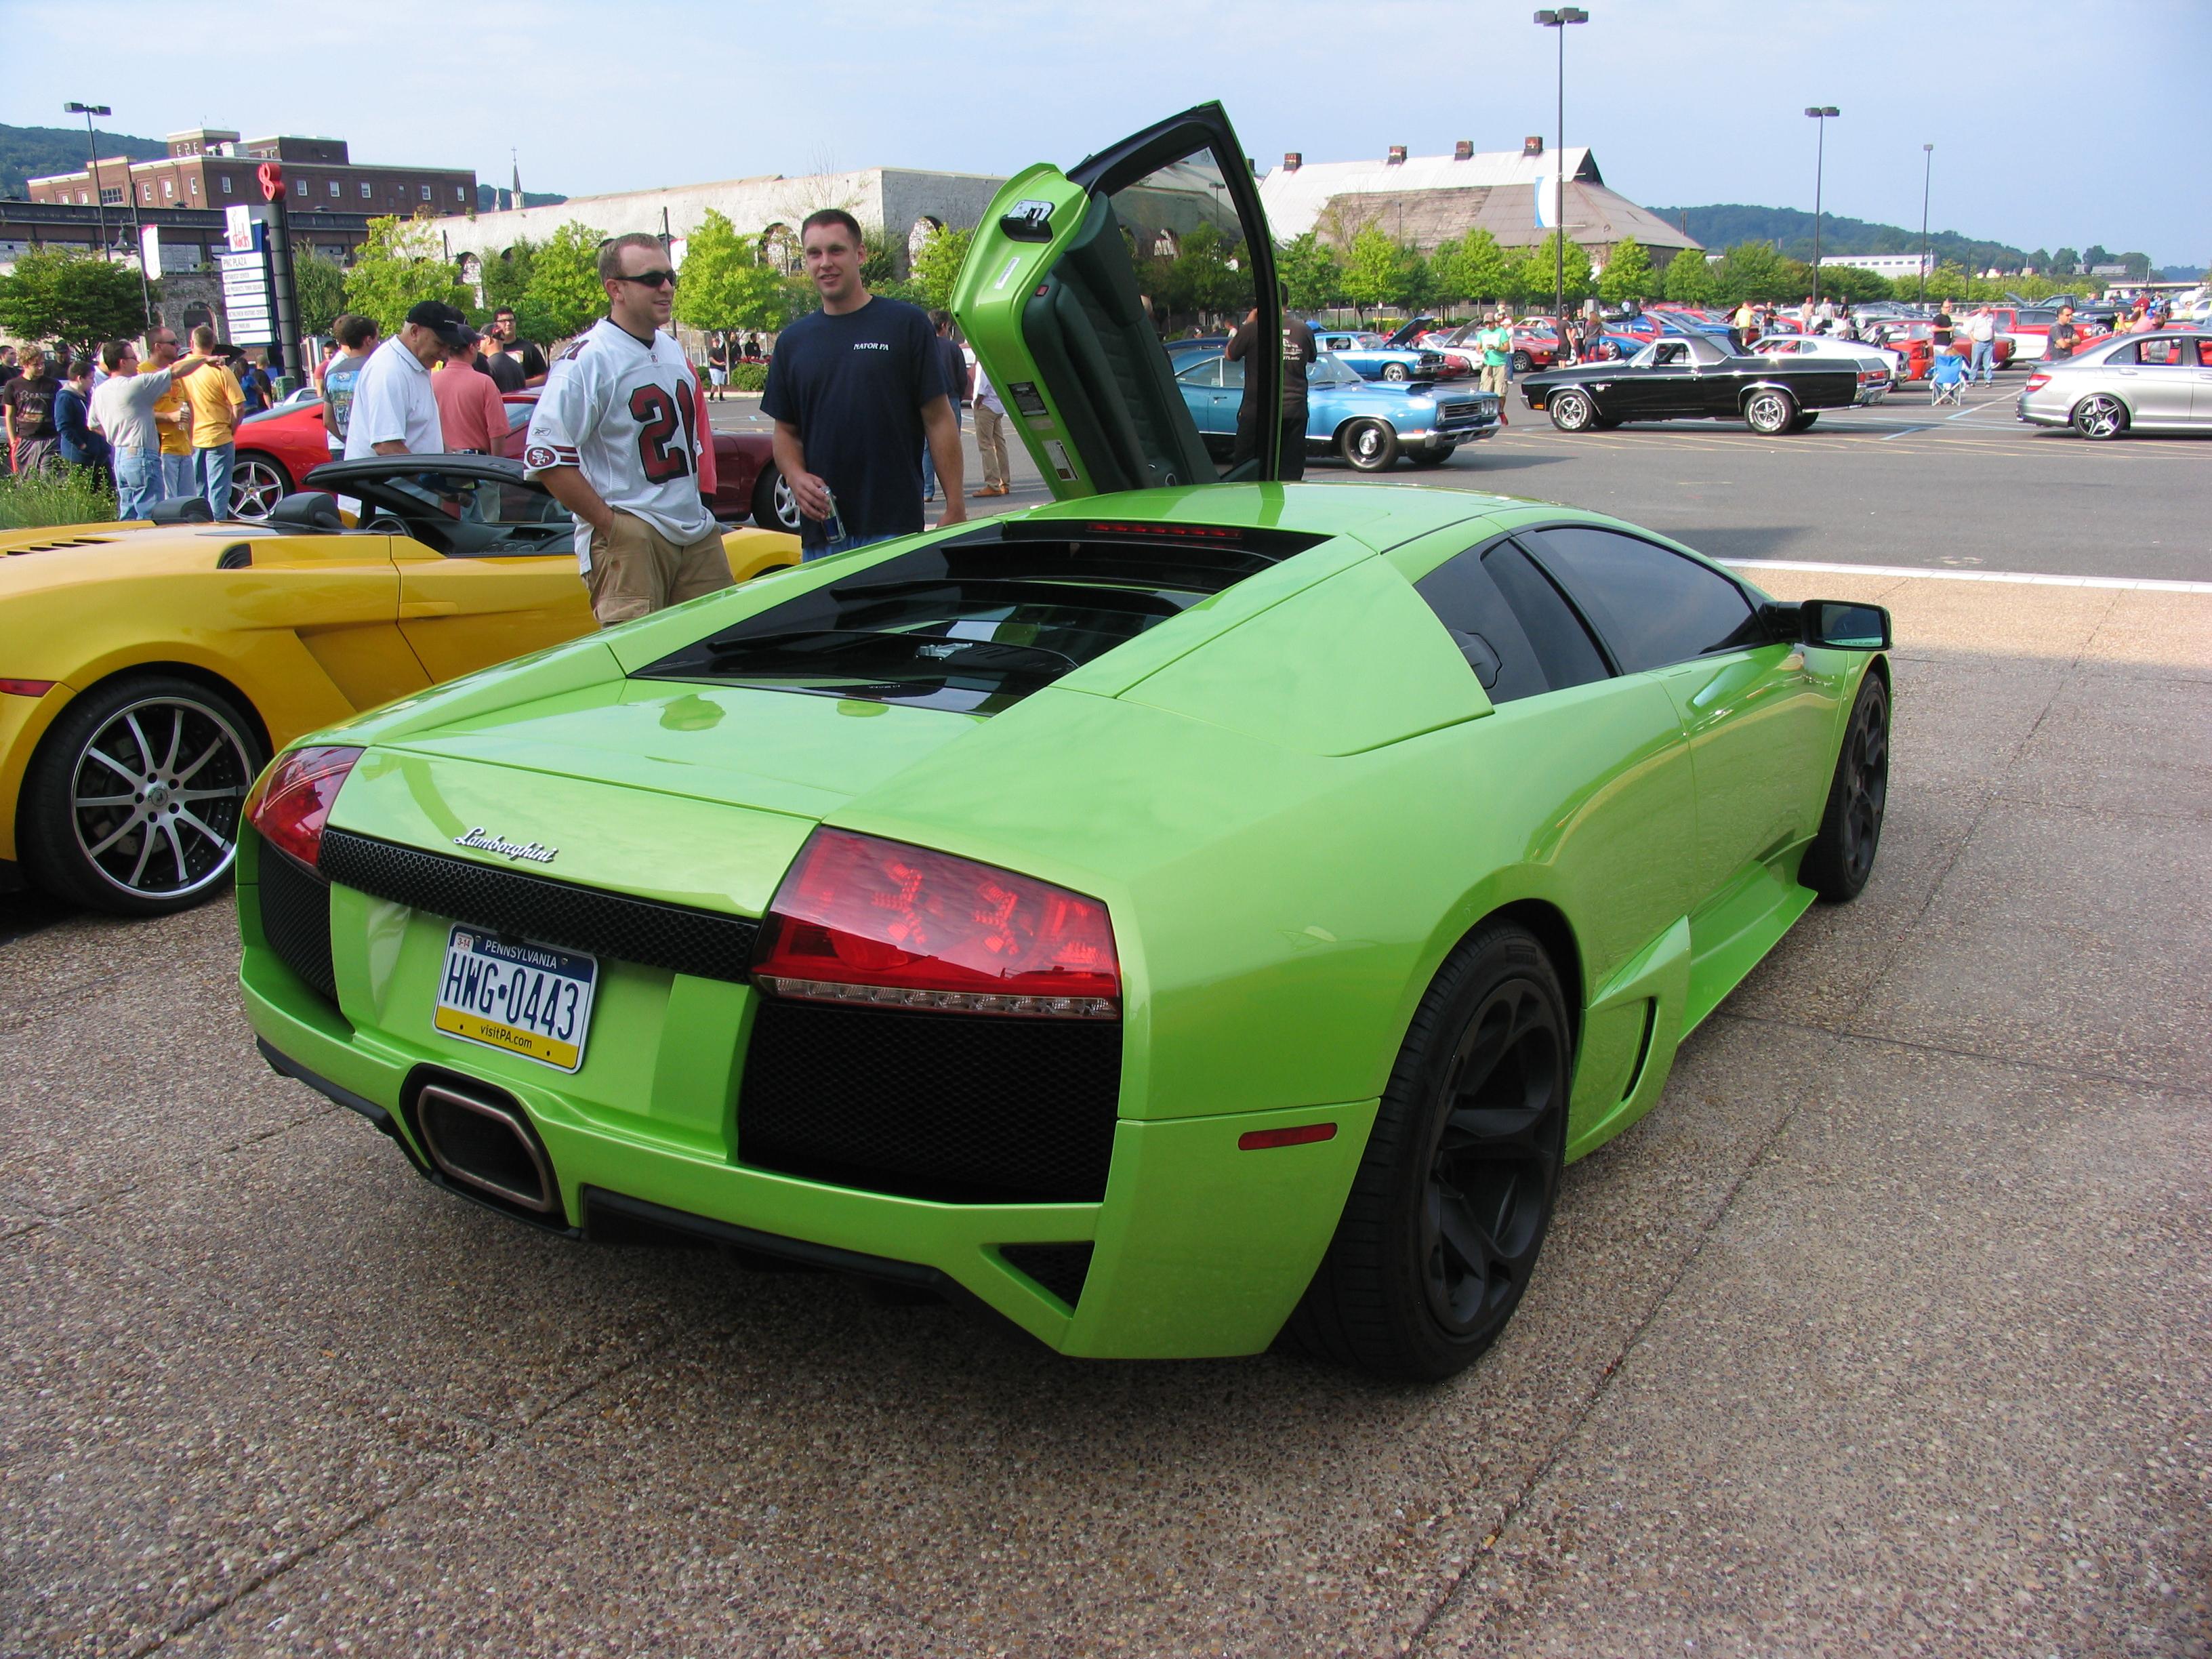 File Lamborghini Murcielago Lp640 4 9704074654 Jpg Wikimedia Commons